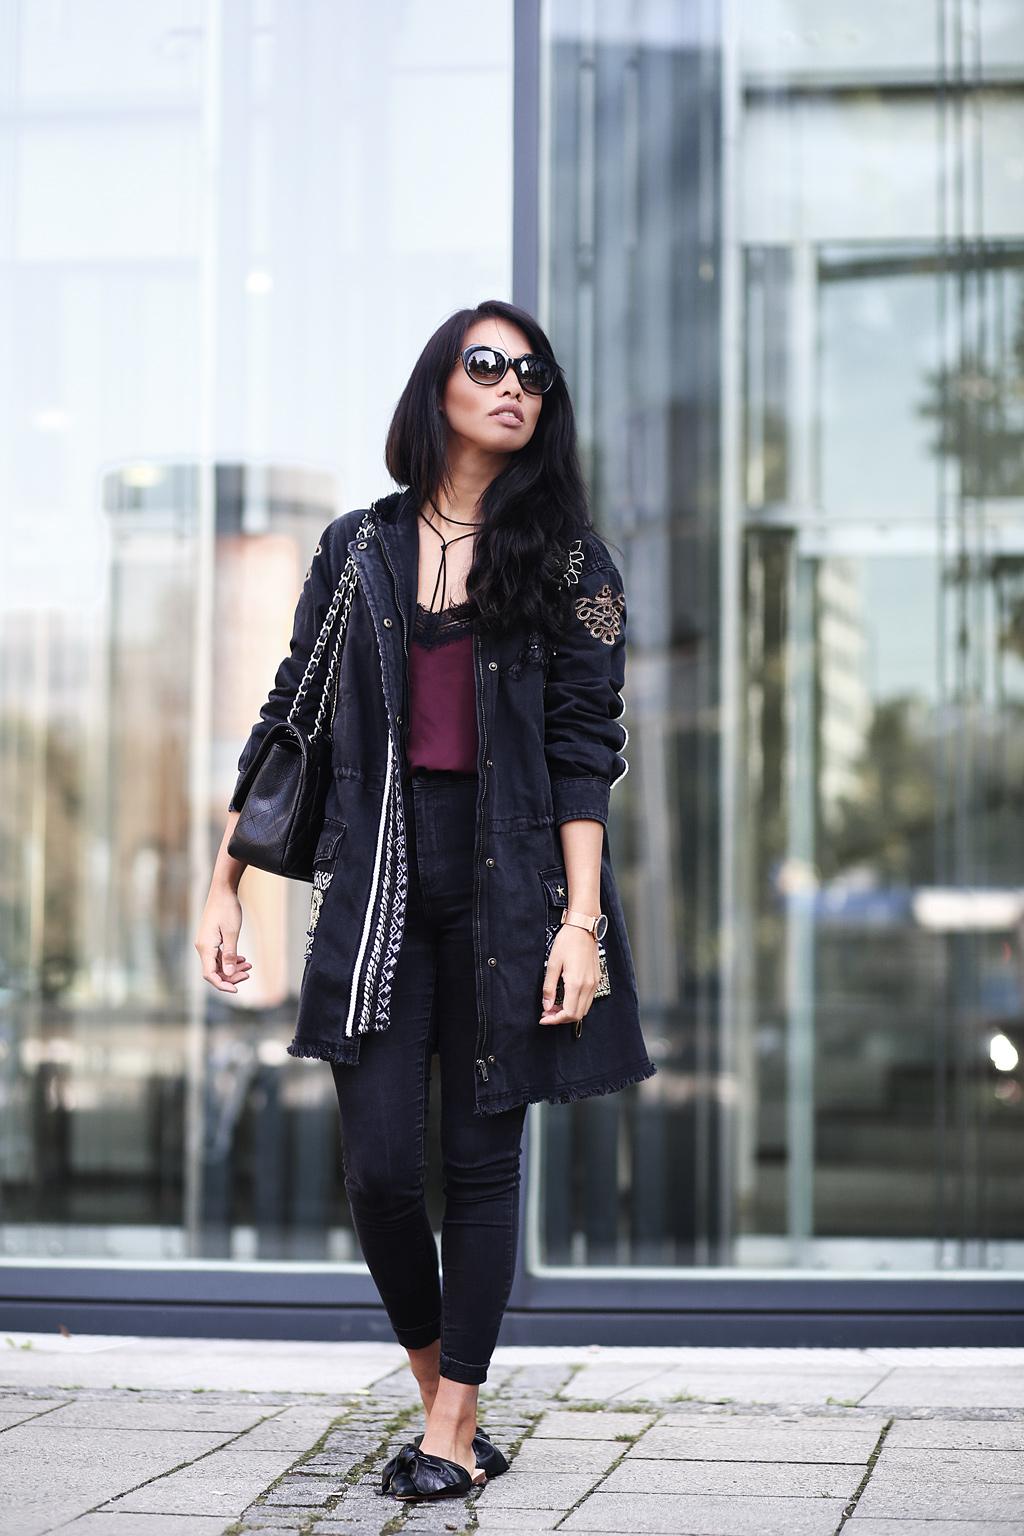 thefashionanarchy_blogger_fashionblog_modeblog_styleblog_fashionblog_outfit_exotic_denim_desigual_streetstyle_look_munich_muenchen_munichblogger_styleblog_chanel_slipper_4